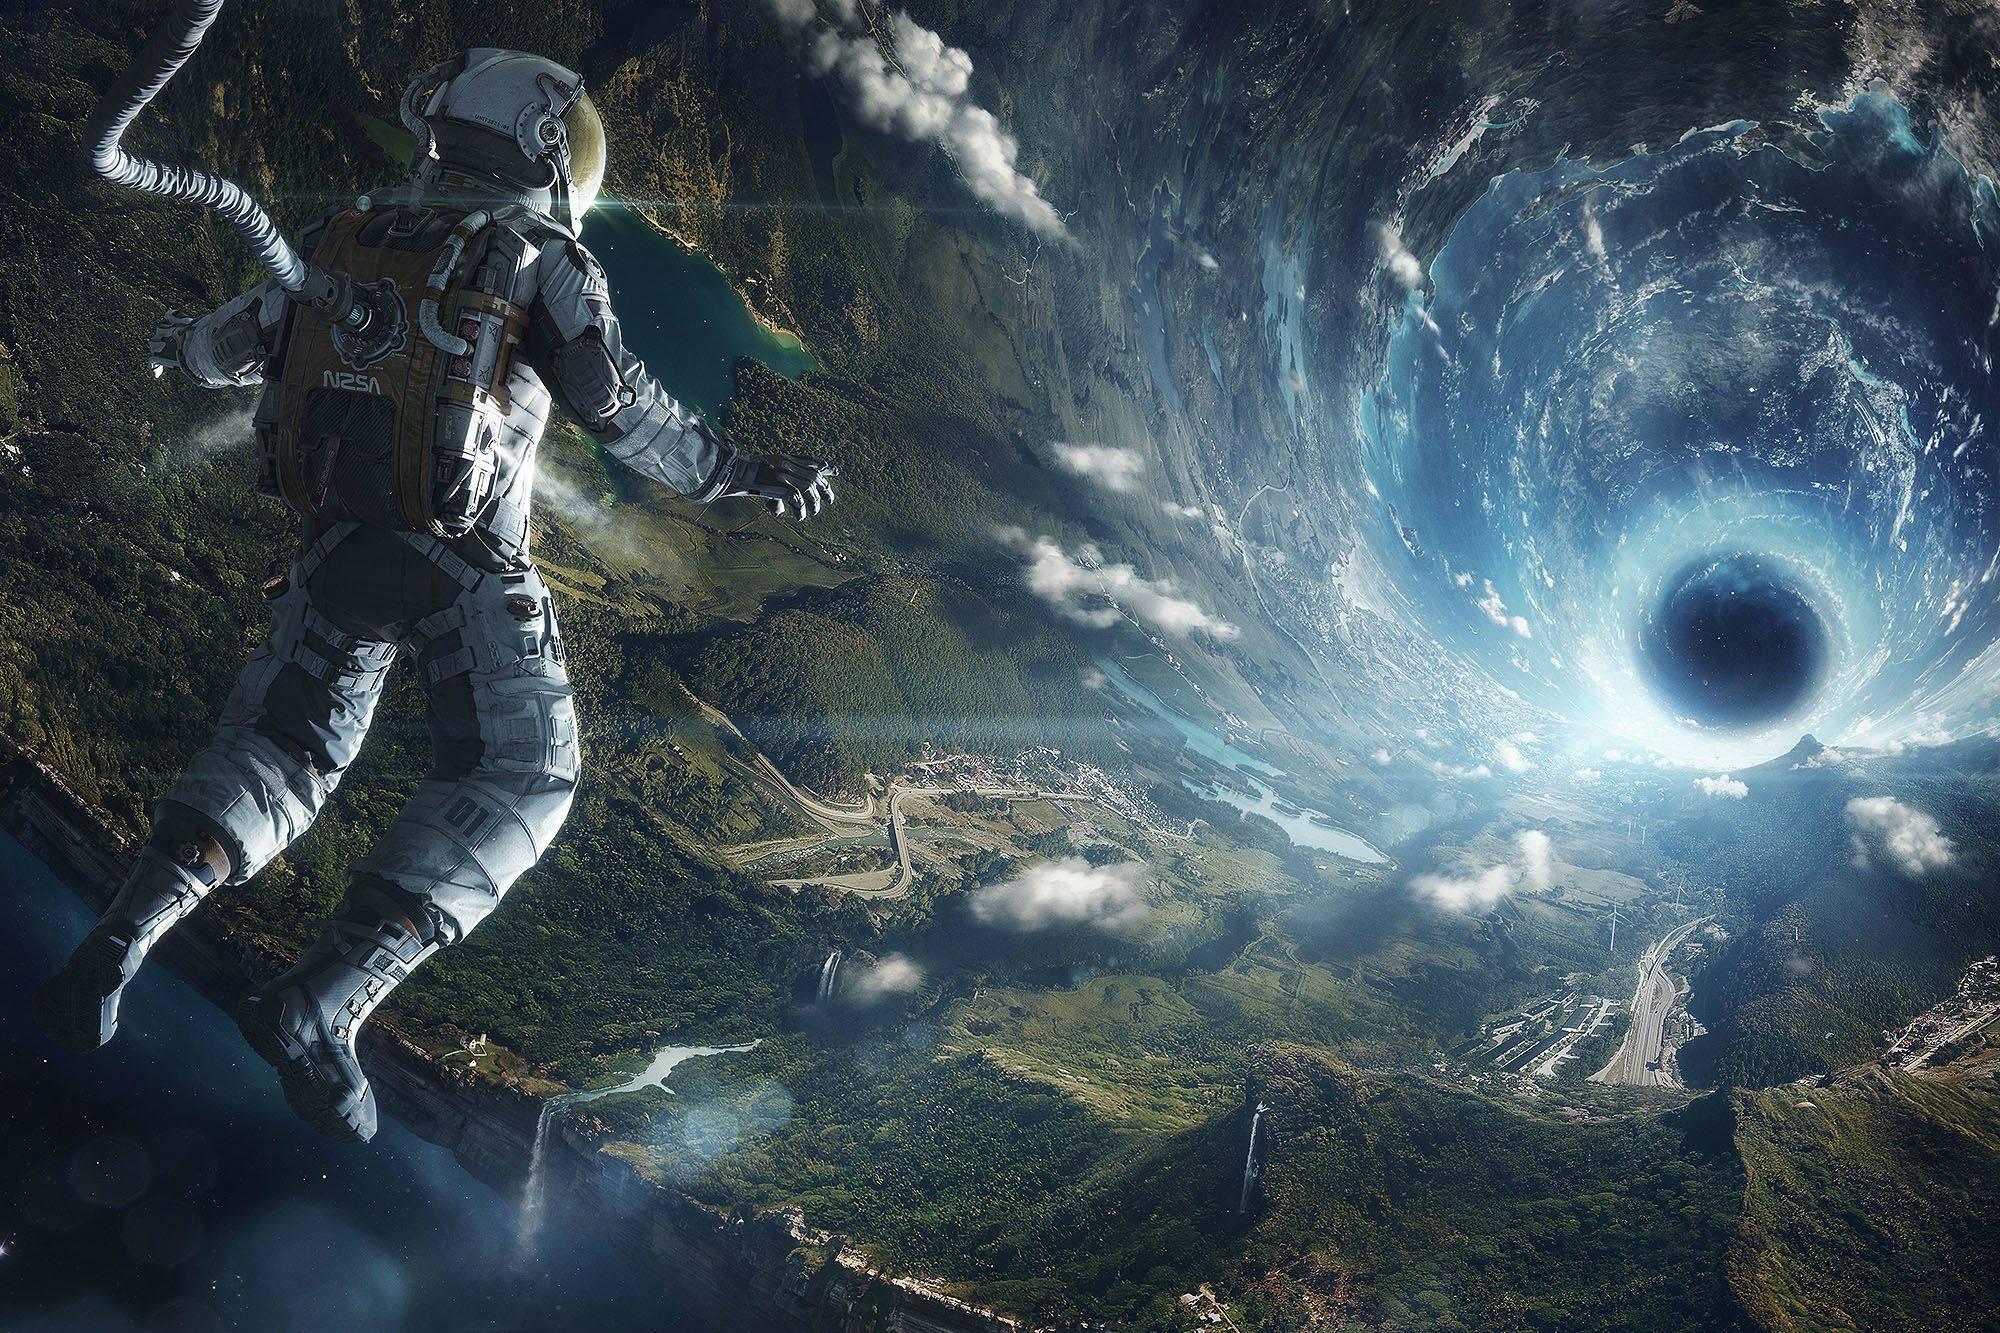 astronaut black hole wallpaper   Imgur 2000x1333